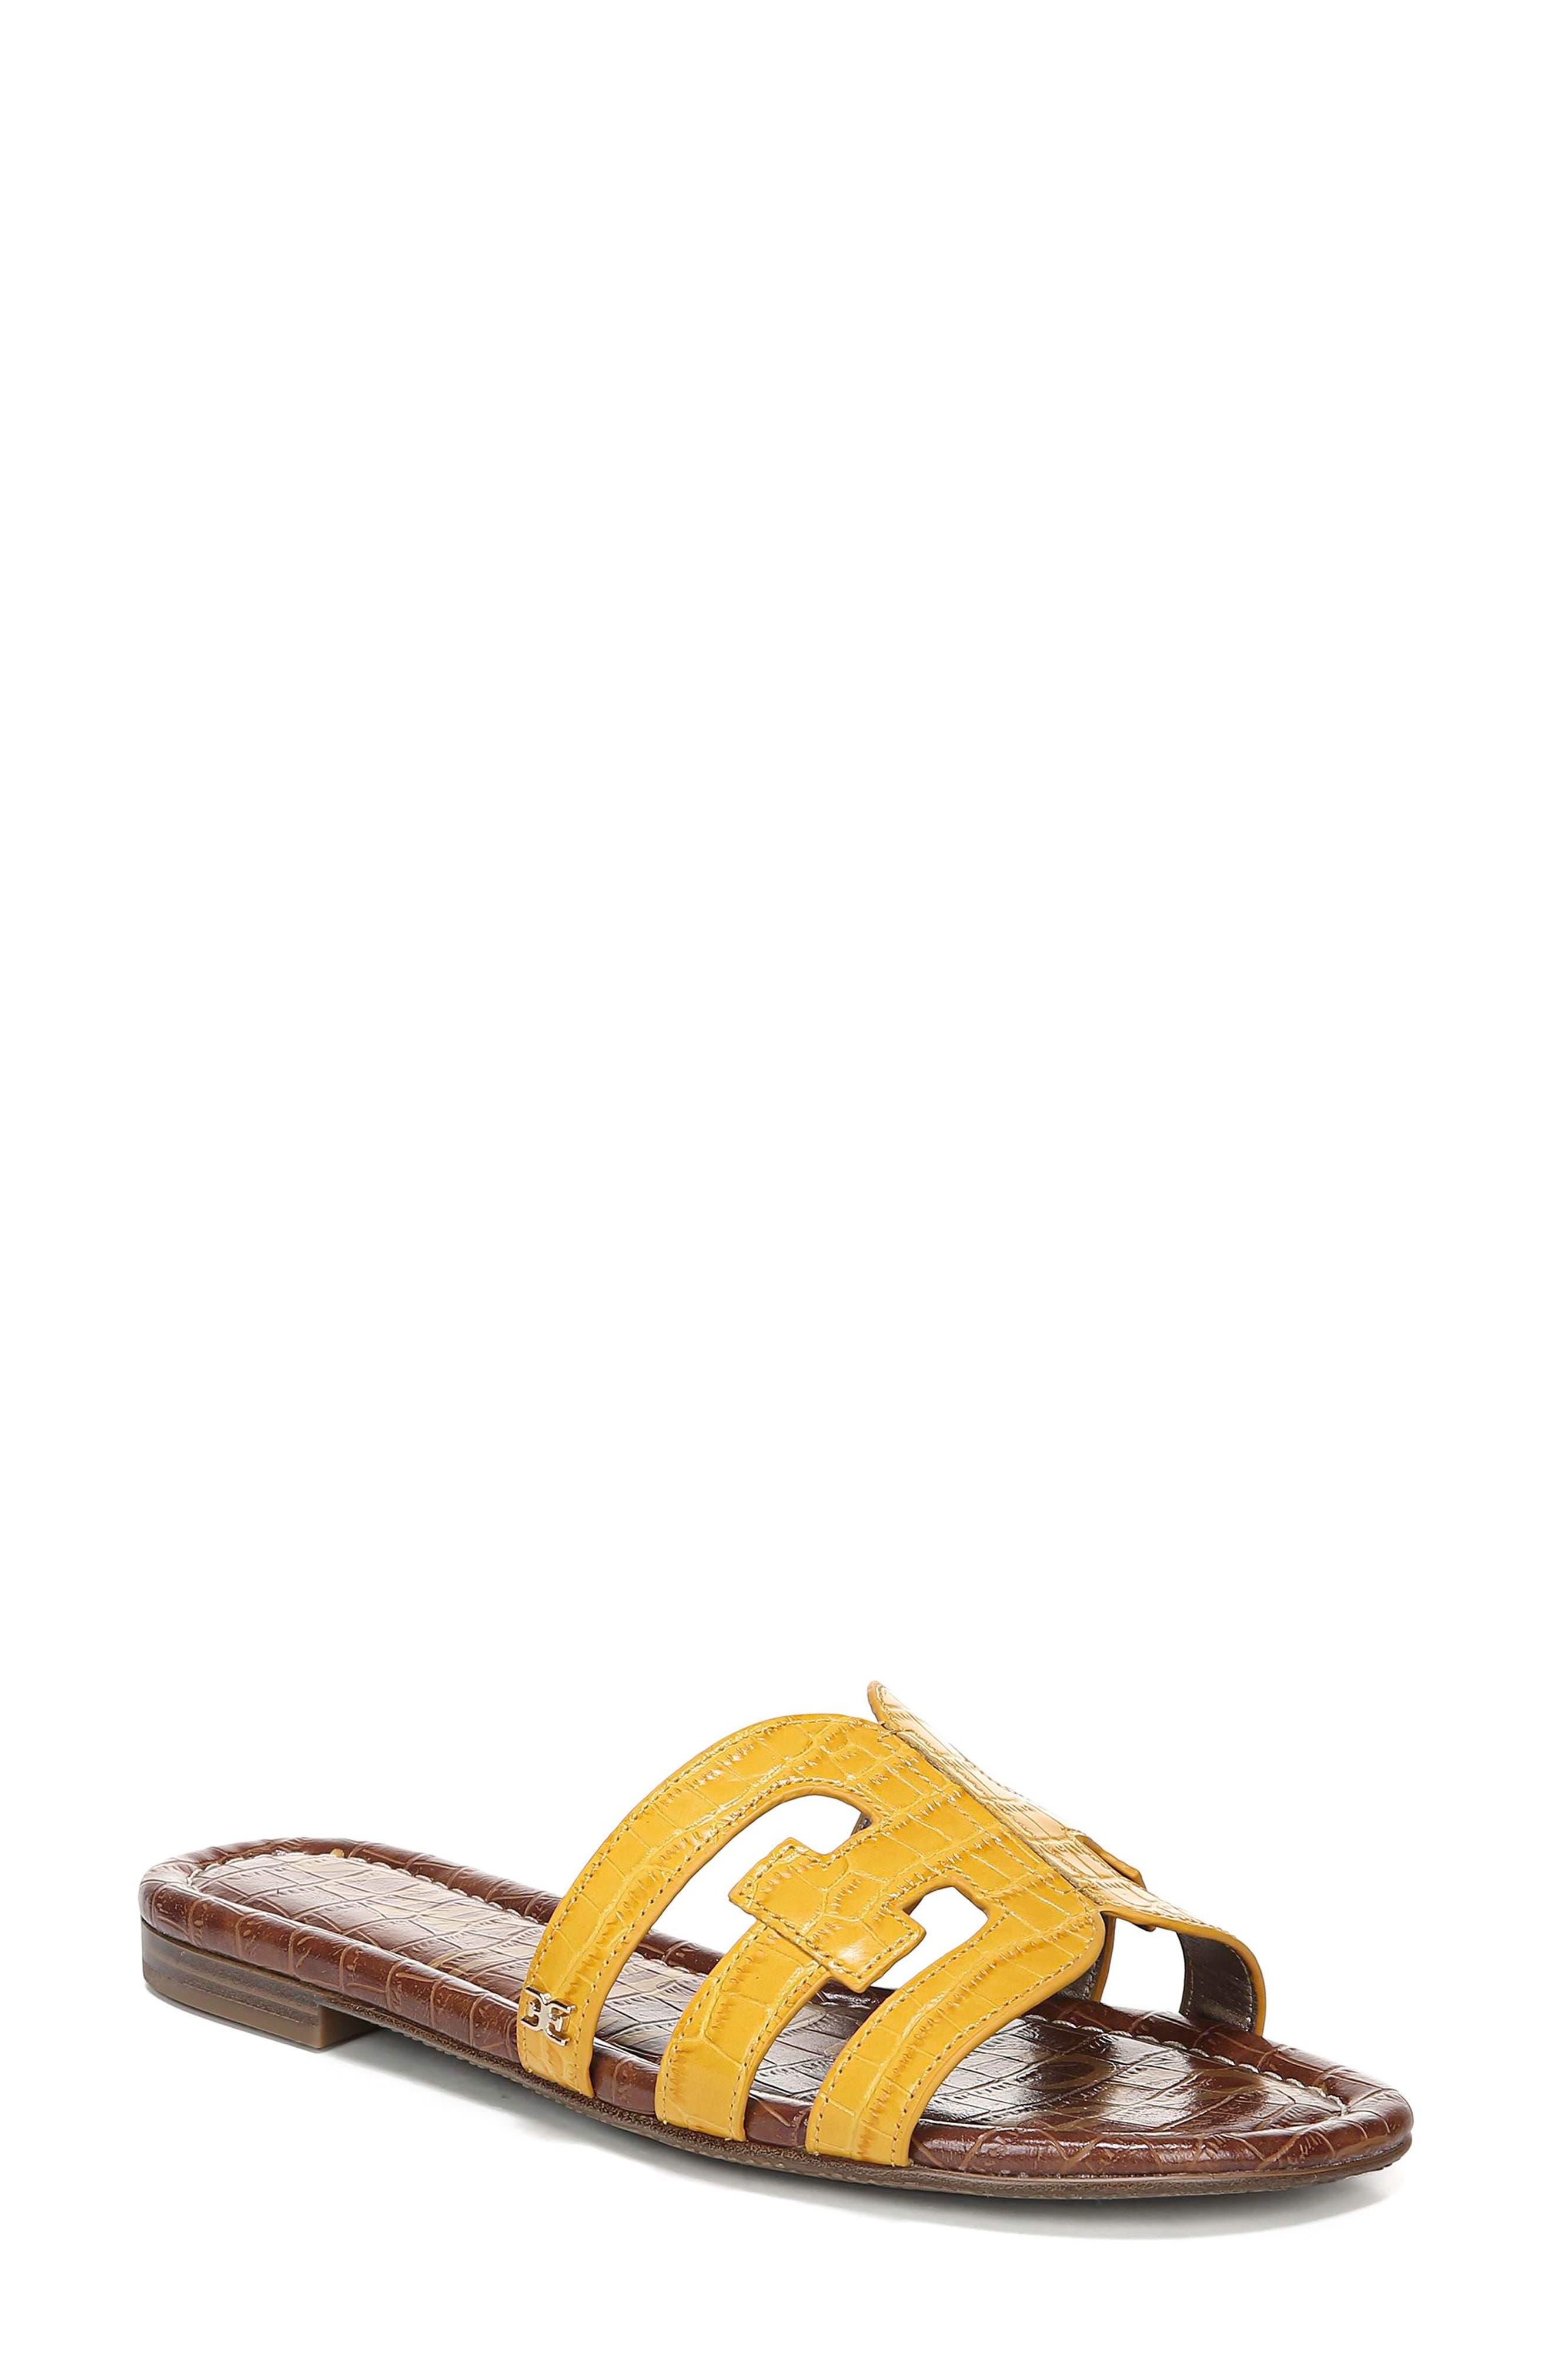 56a5110279c Women's Slide Sandals   Nordstrom